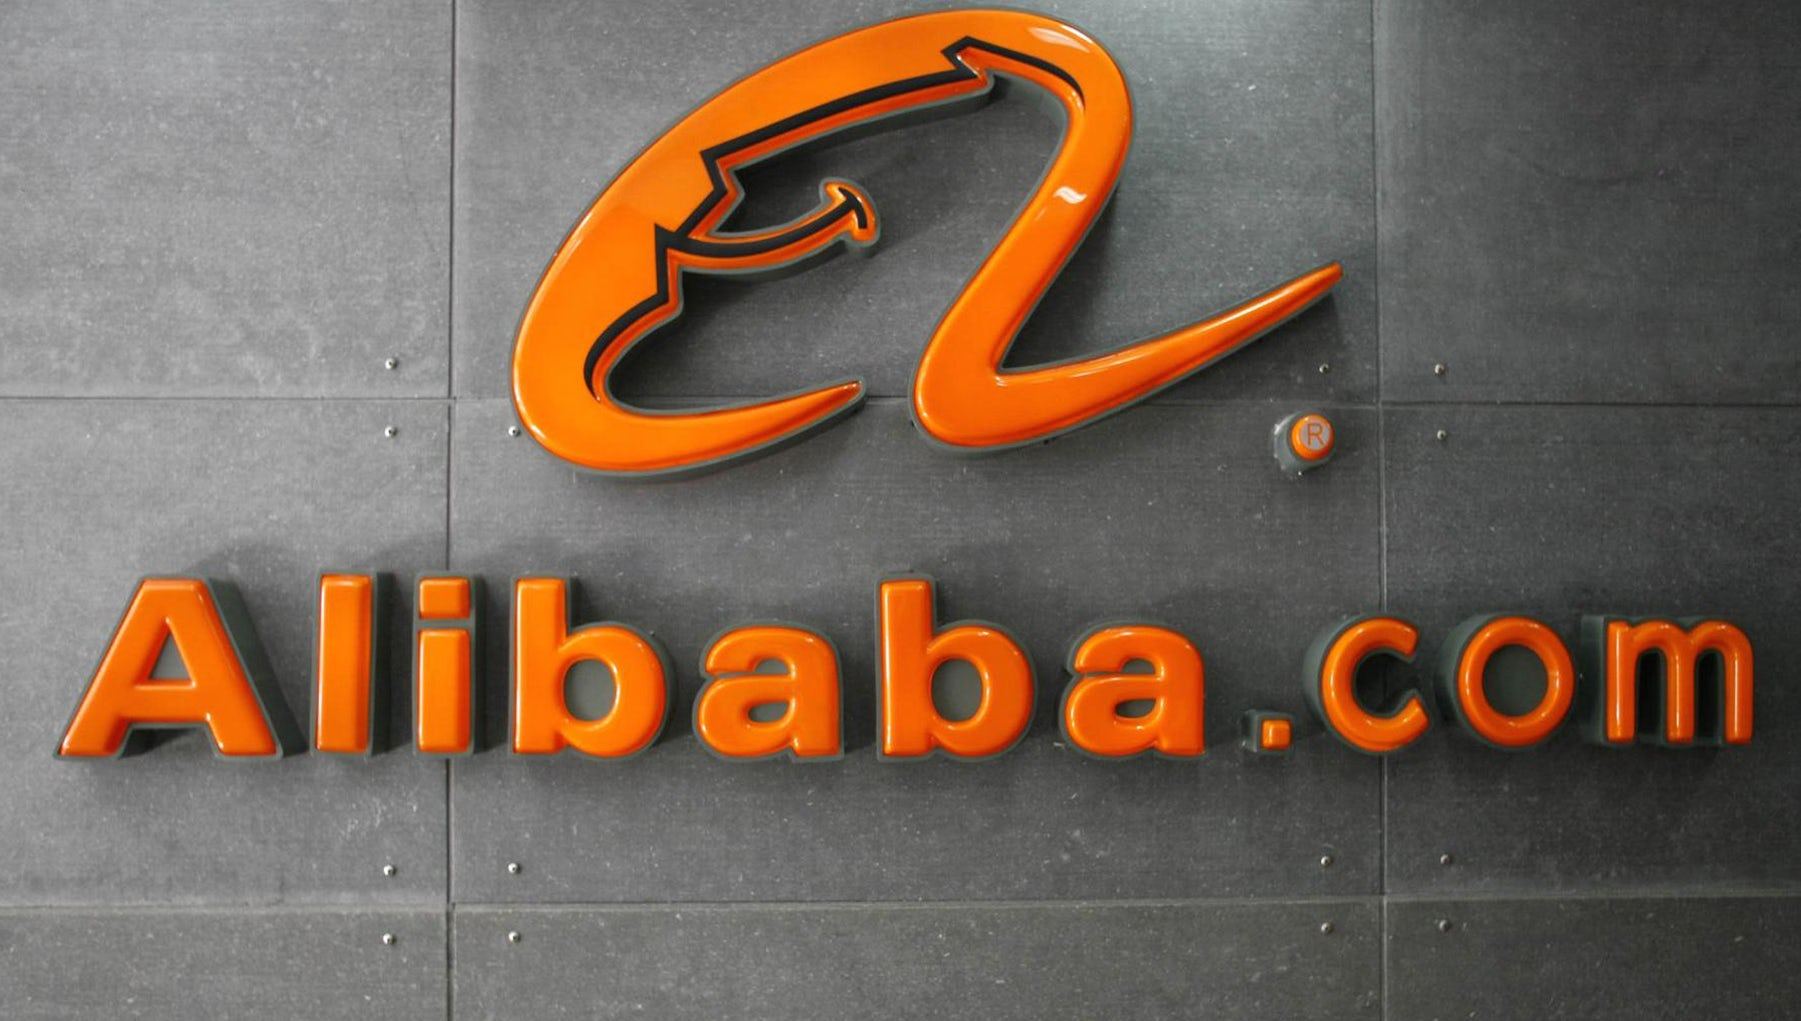 Alibaba's Sales Beat Estimates on Surging Consumer Demand